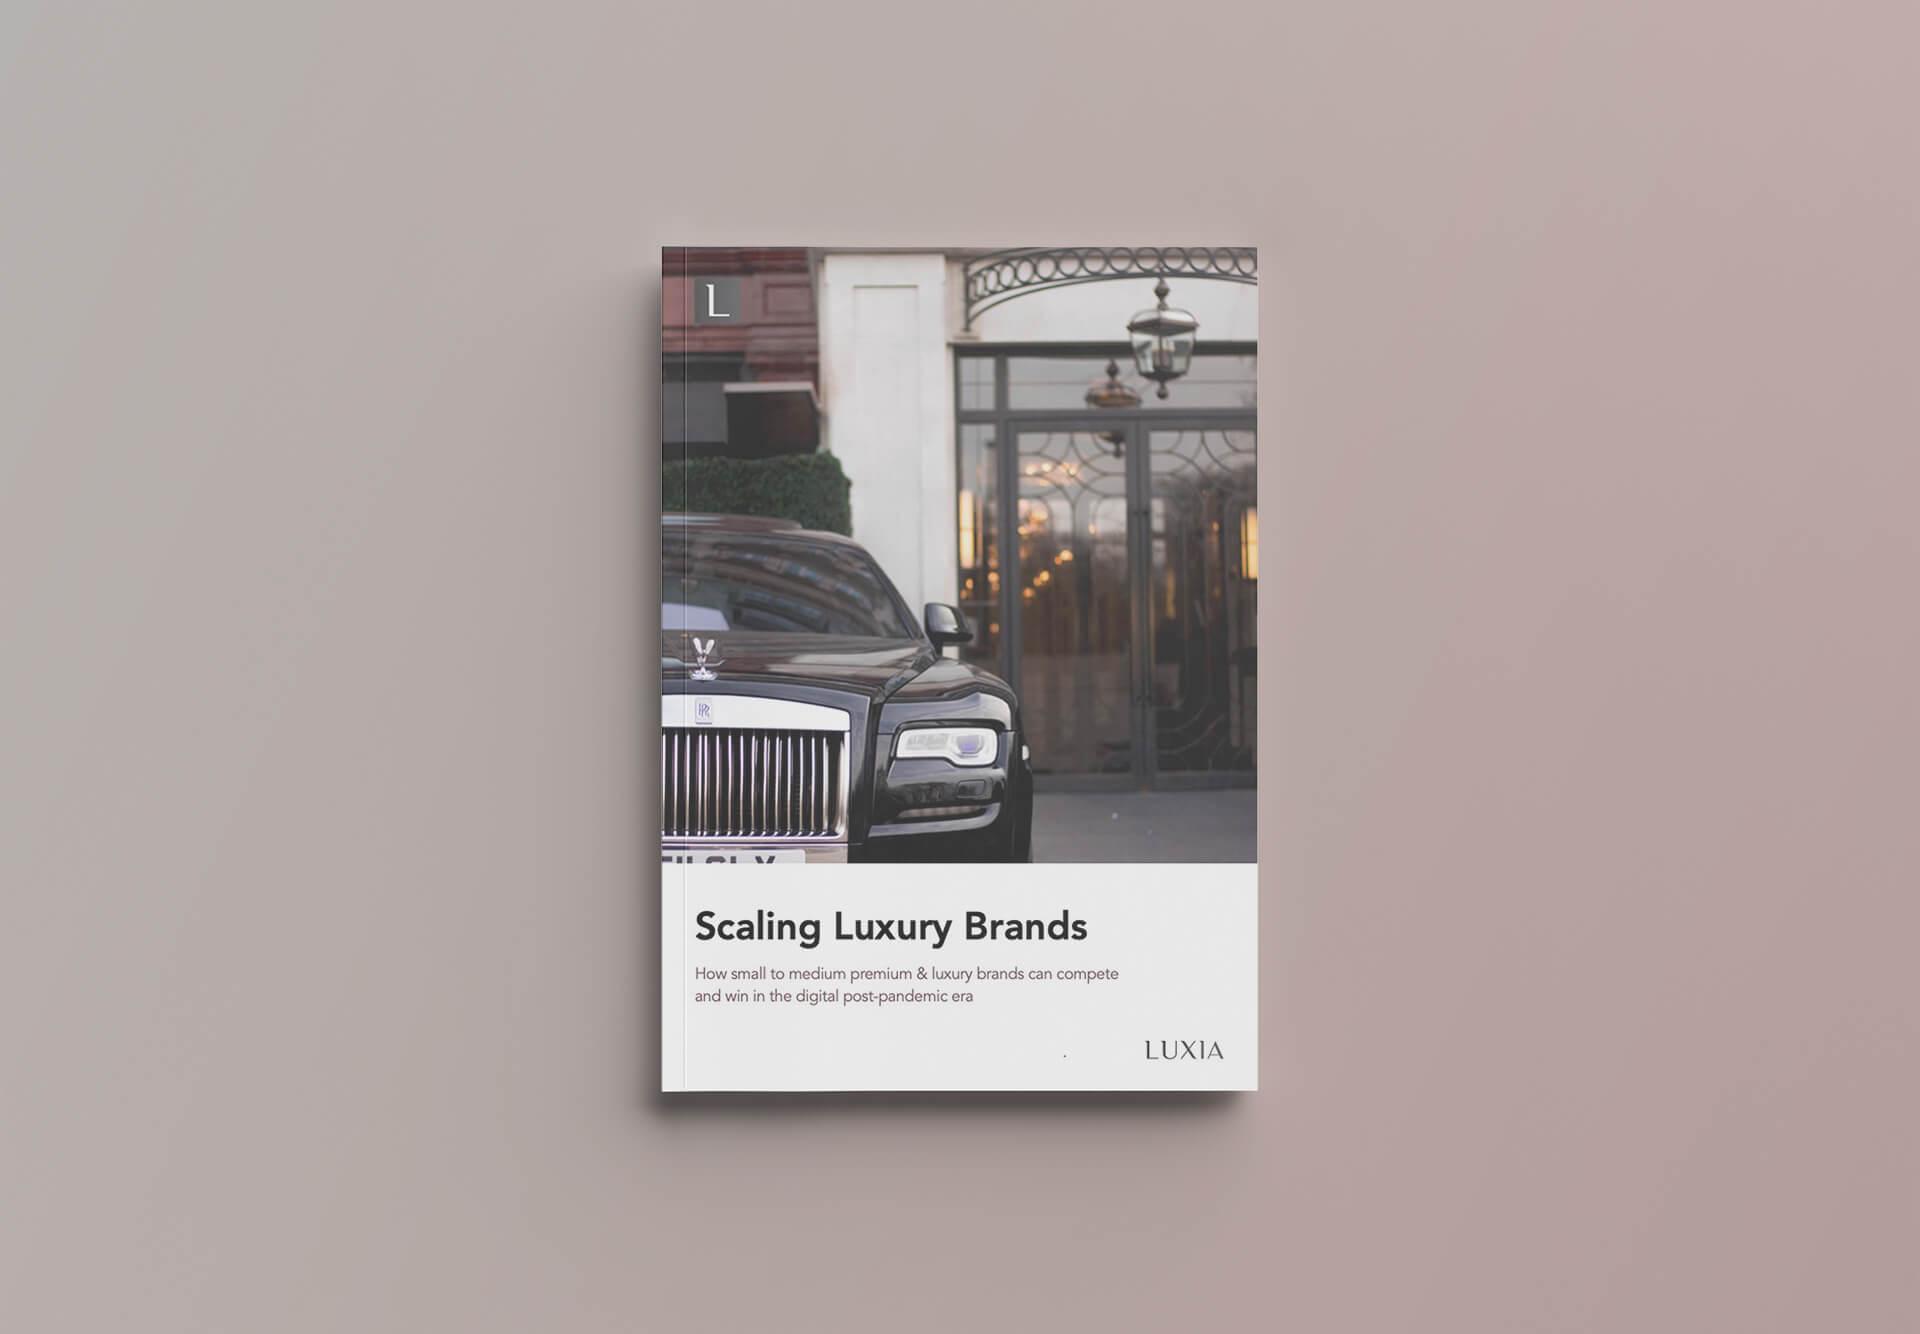 Scaling Luxury Brands